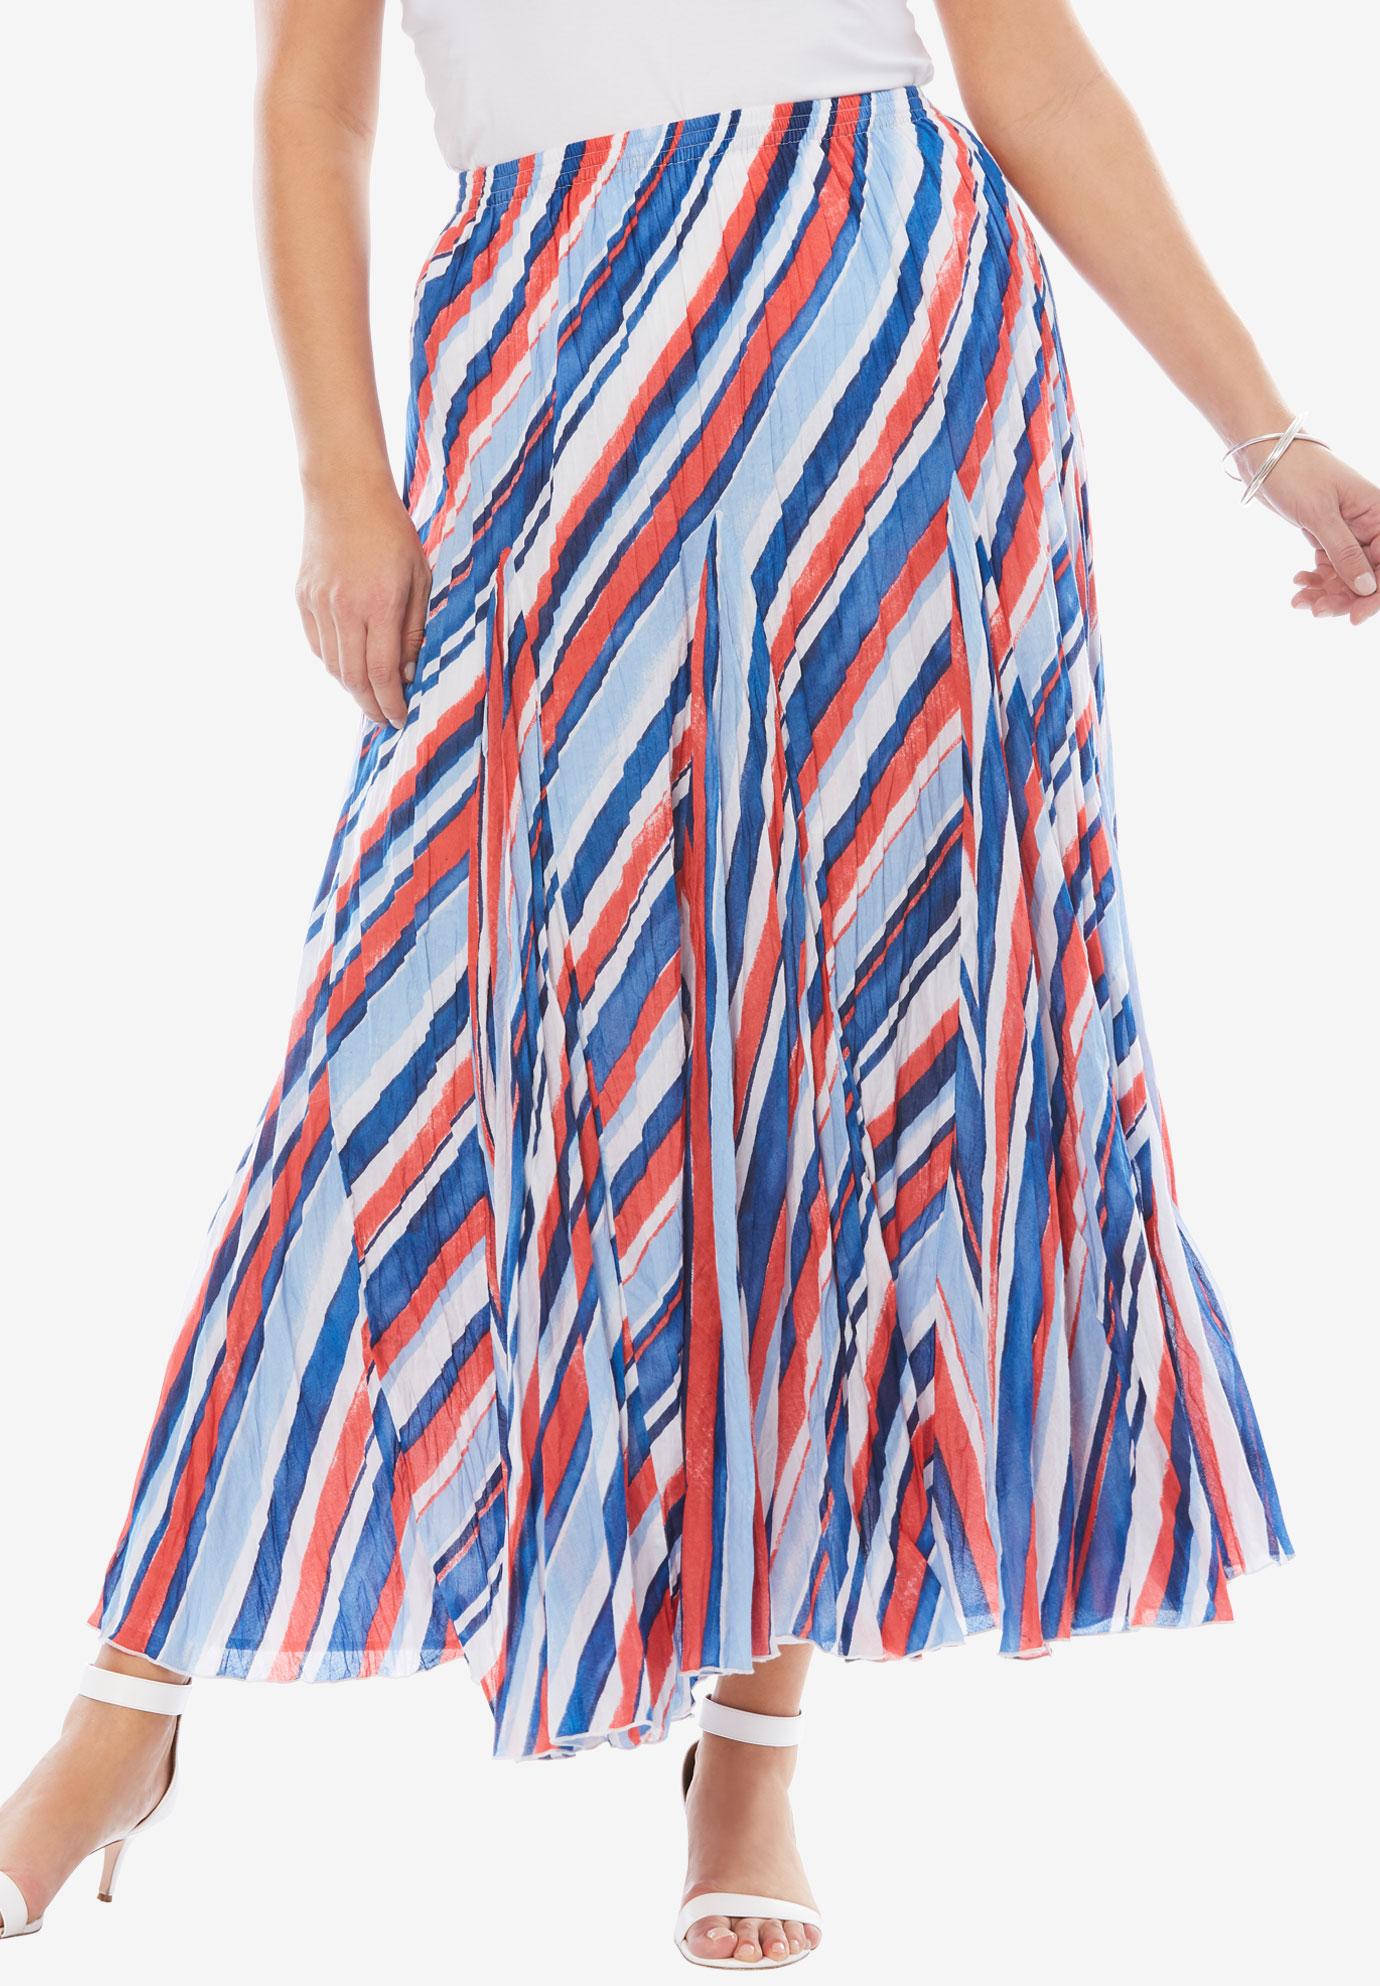 26f37ed319 Cotton Crinkled Maxi Skirt  Plus Size Skirts   Full Beauty